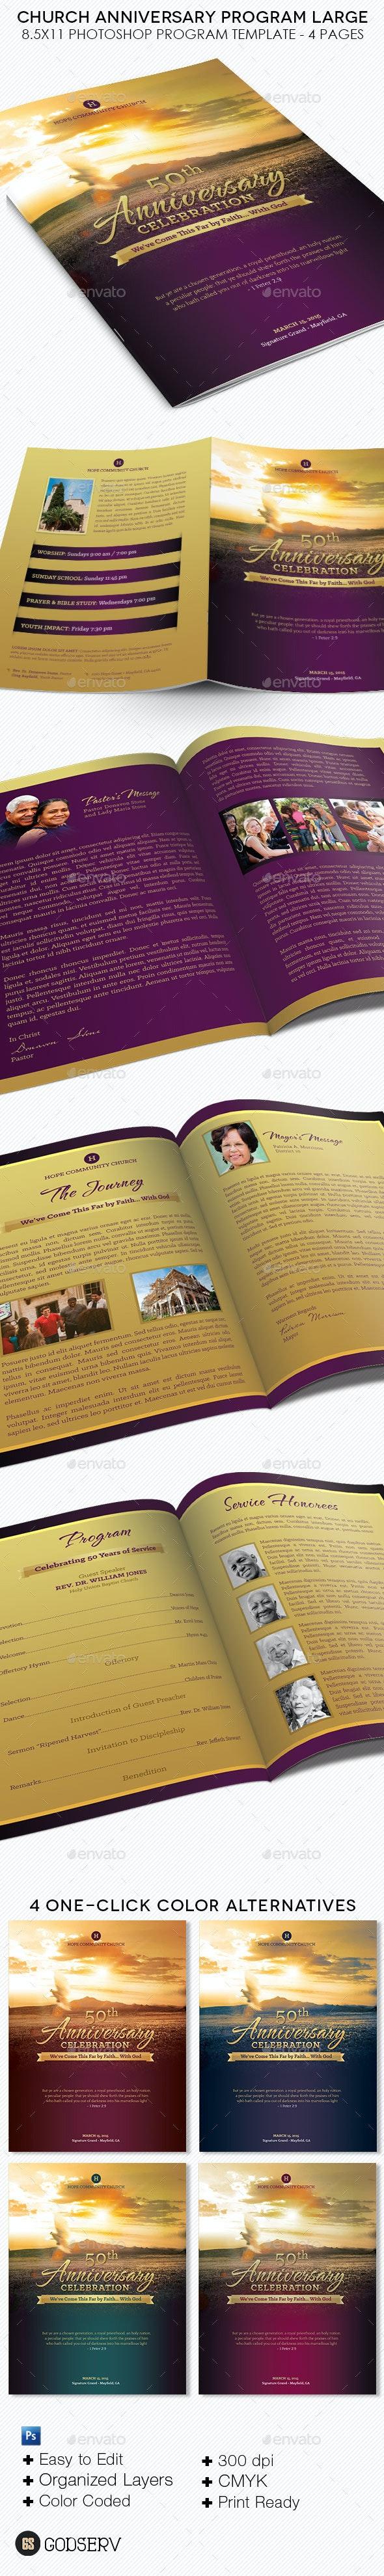 Church Anniversary Service Program Large Template - Informational Brochures